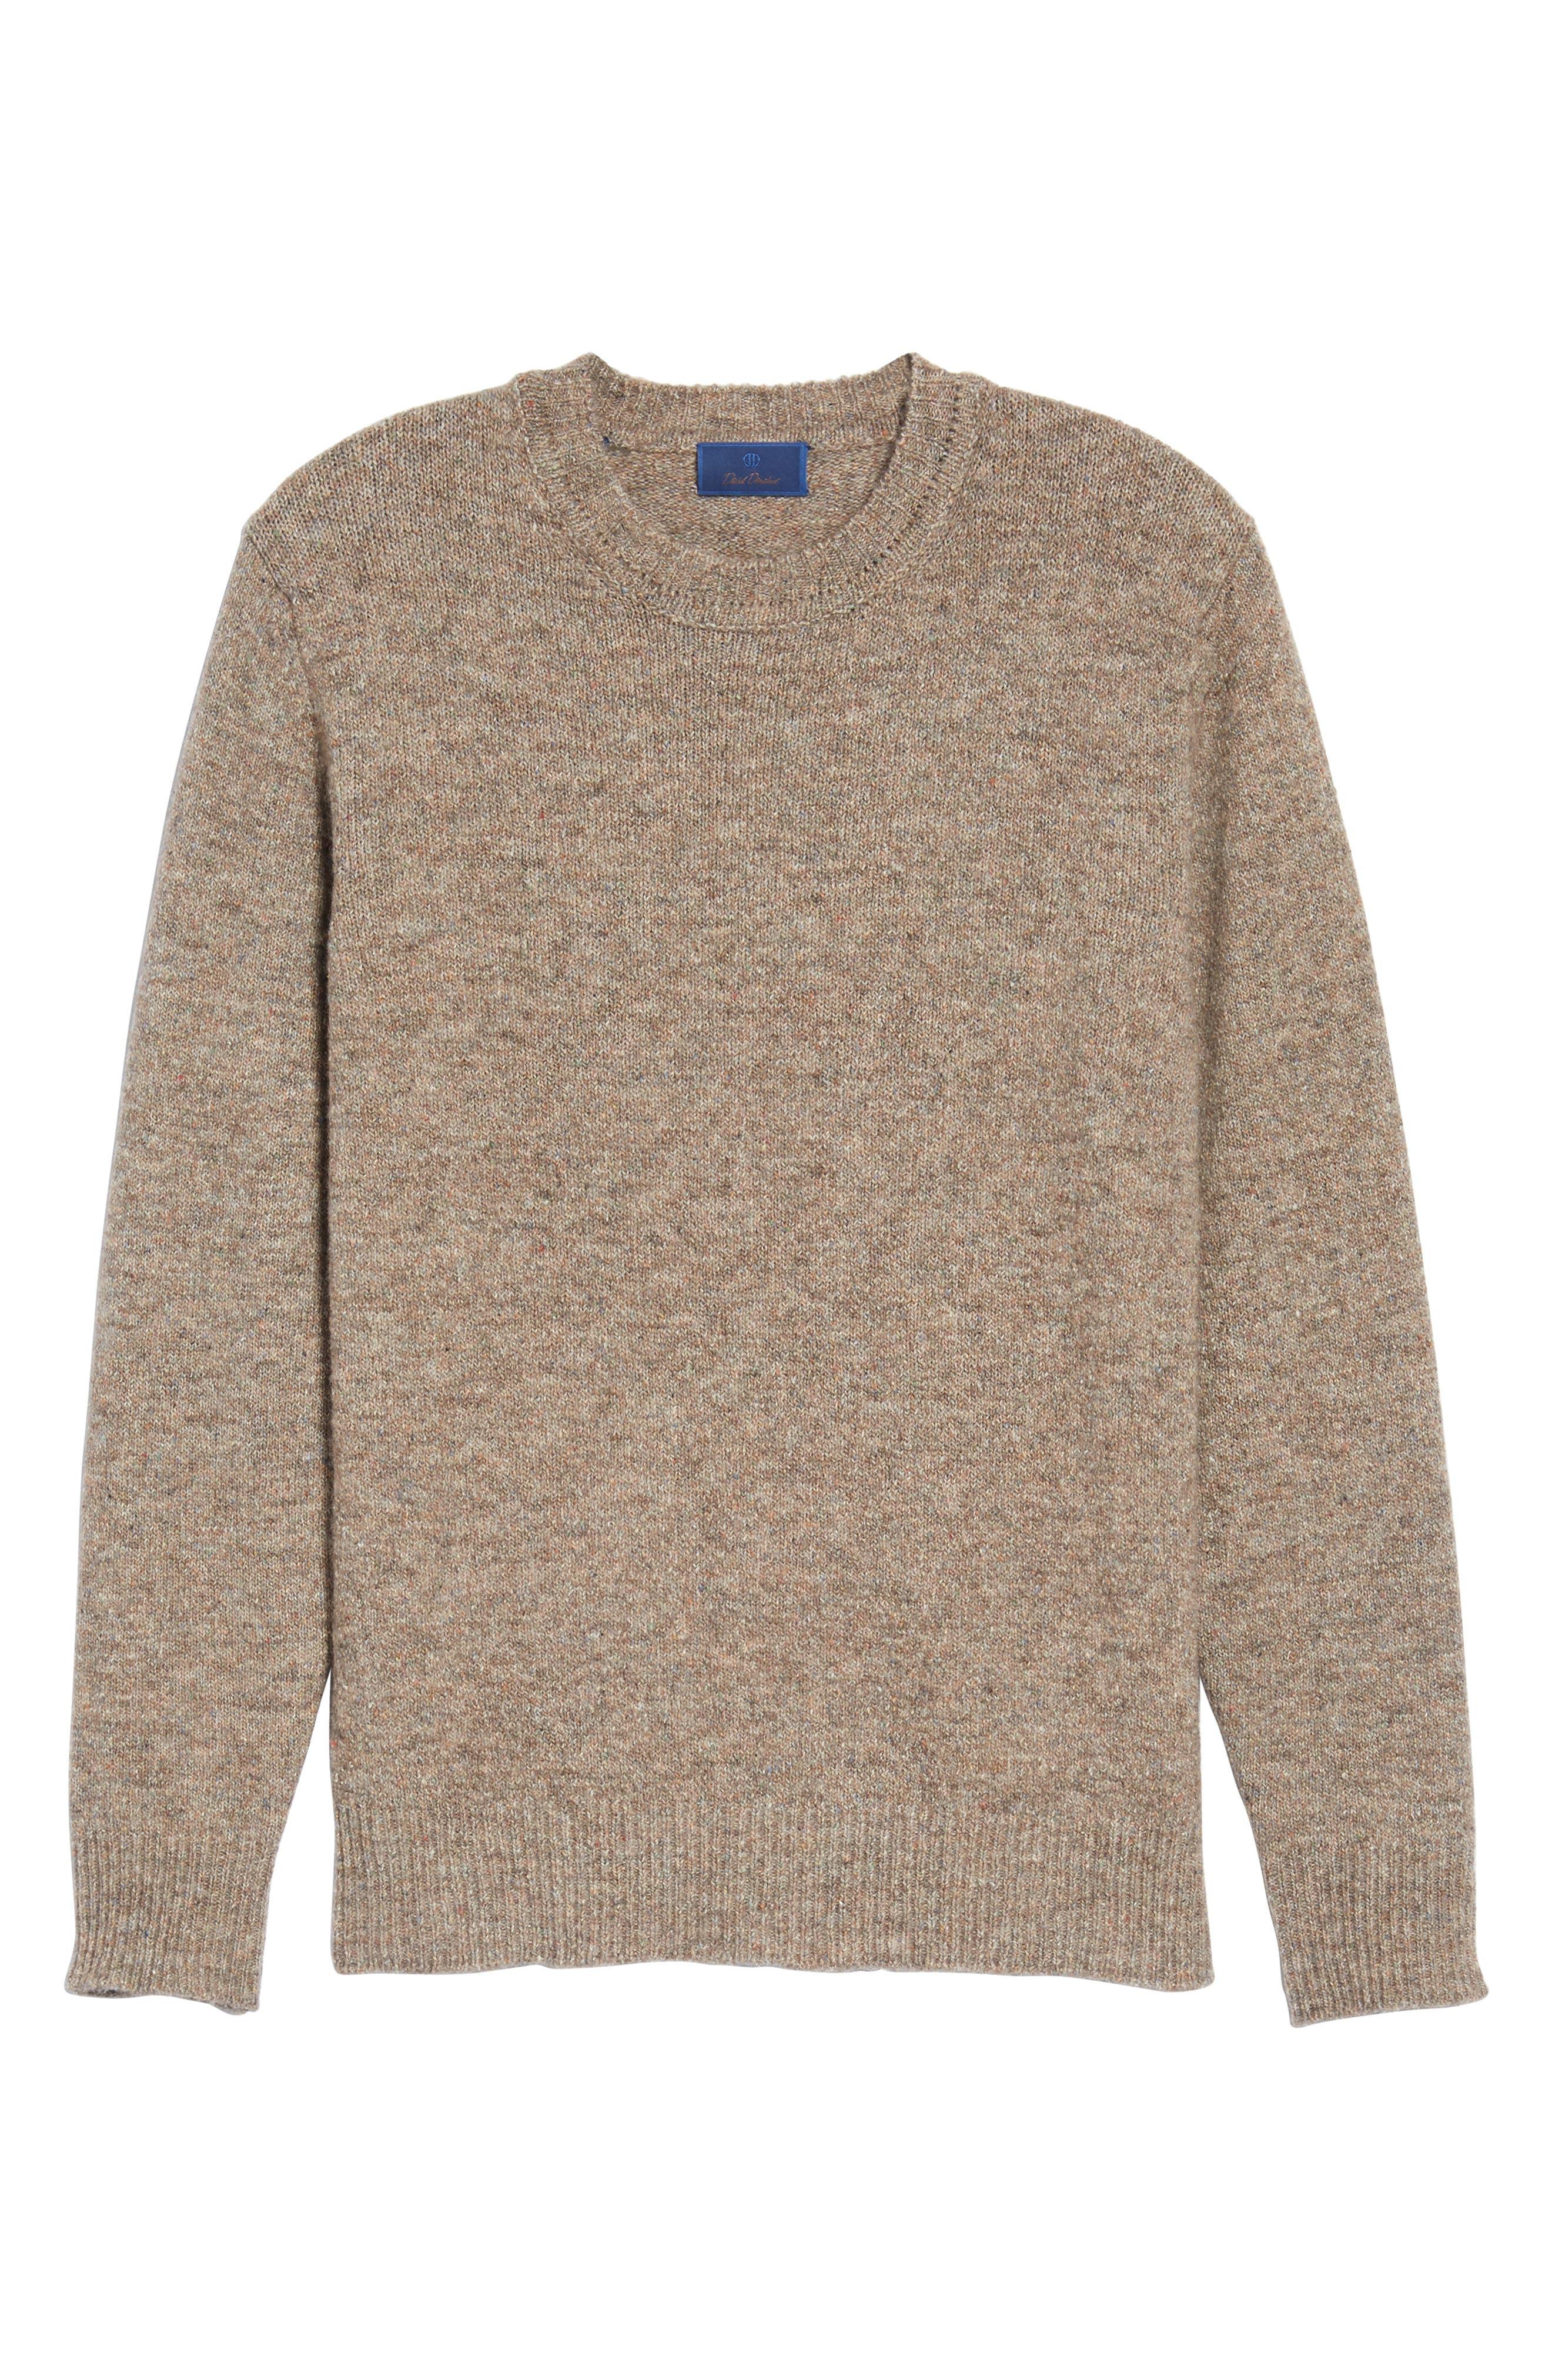 Tweed Crewneck Sweater,                             Alternate thumbnail 6, color,                             285